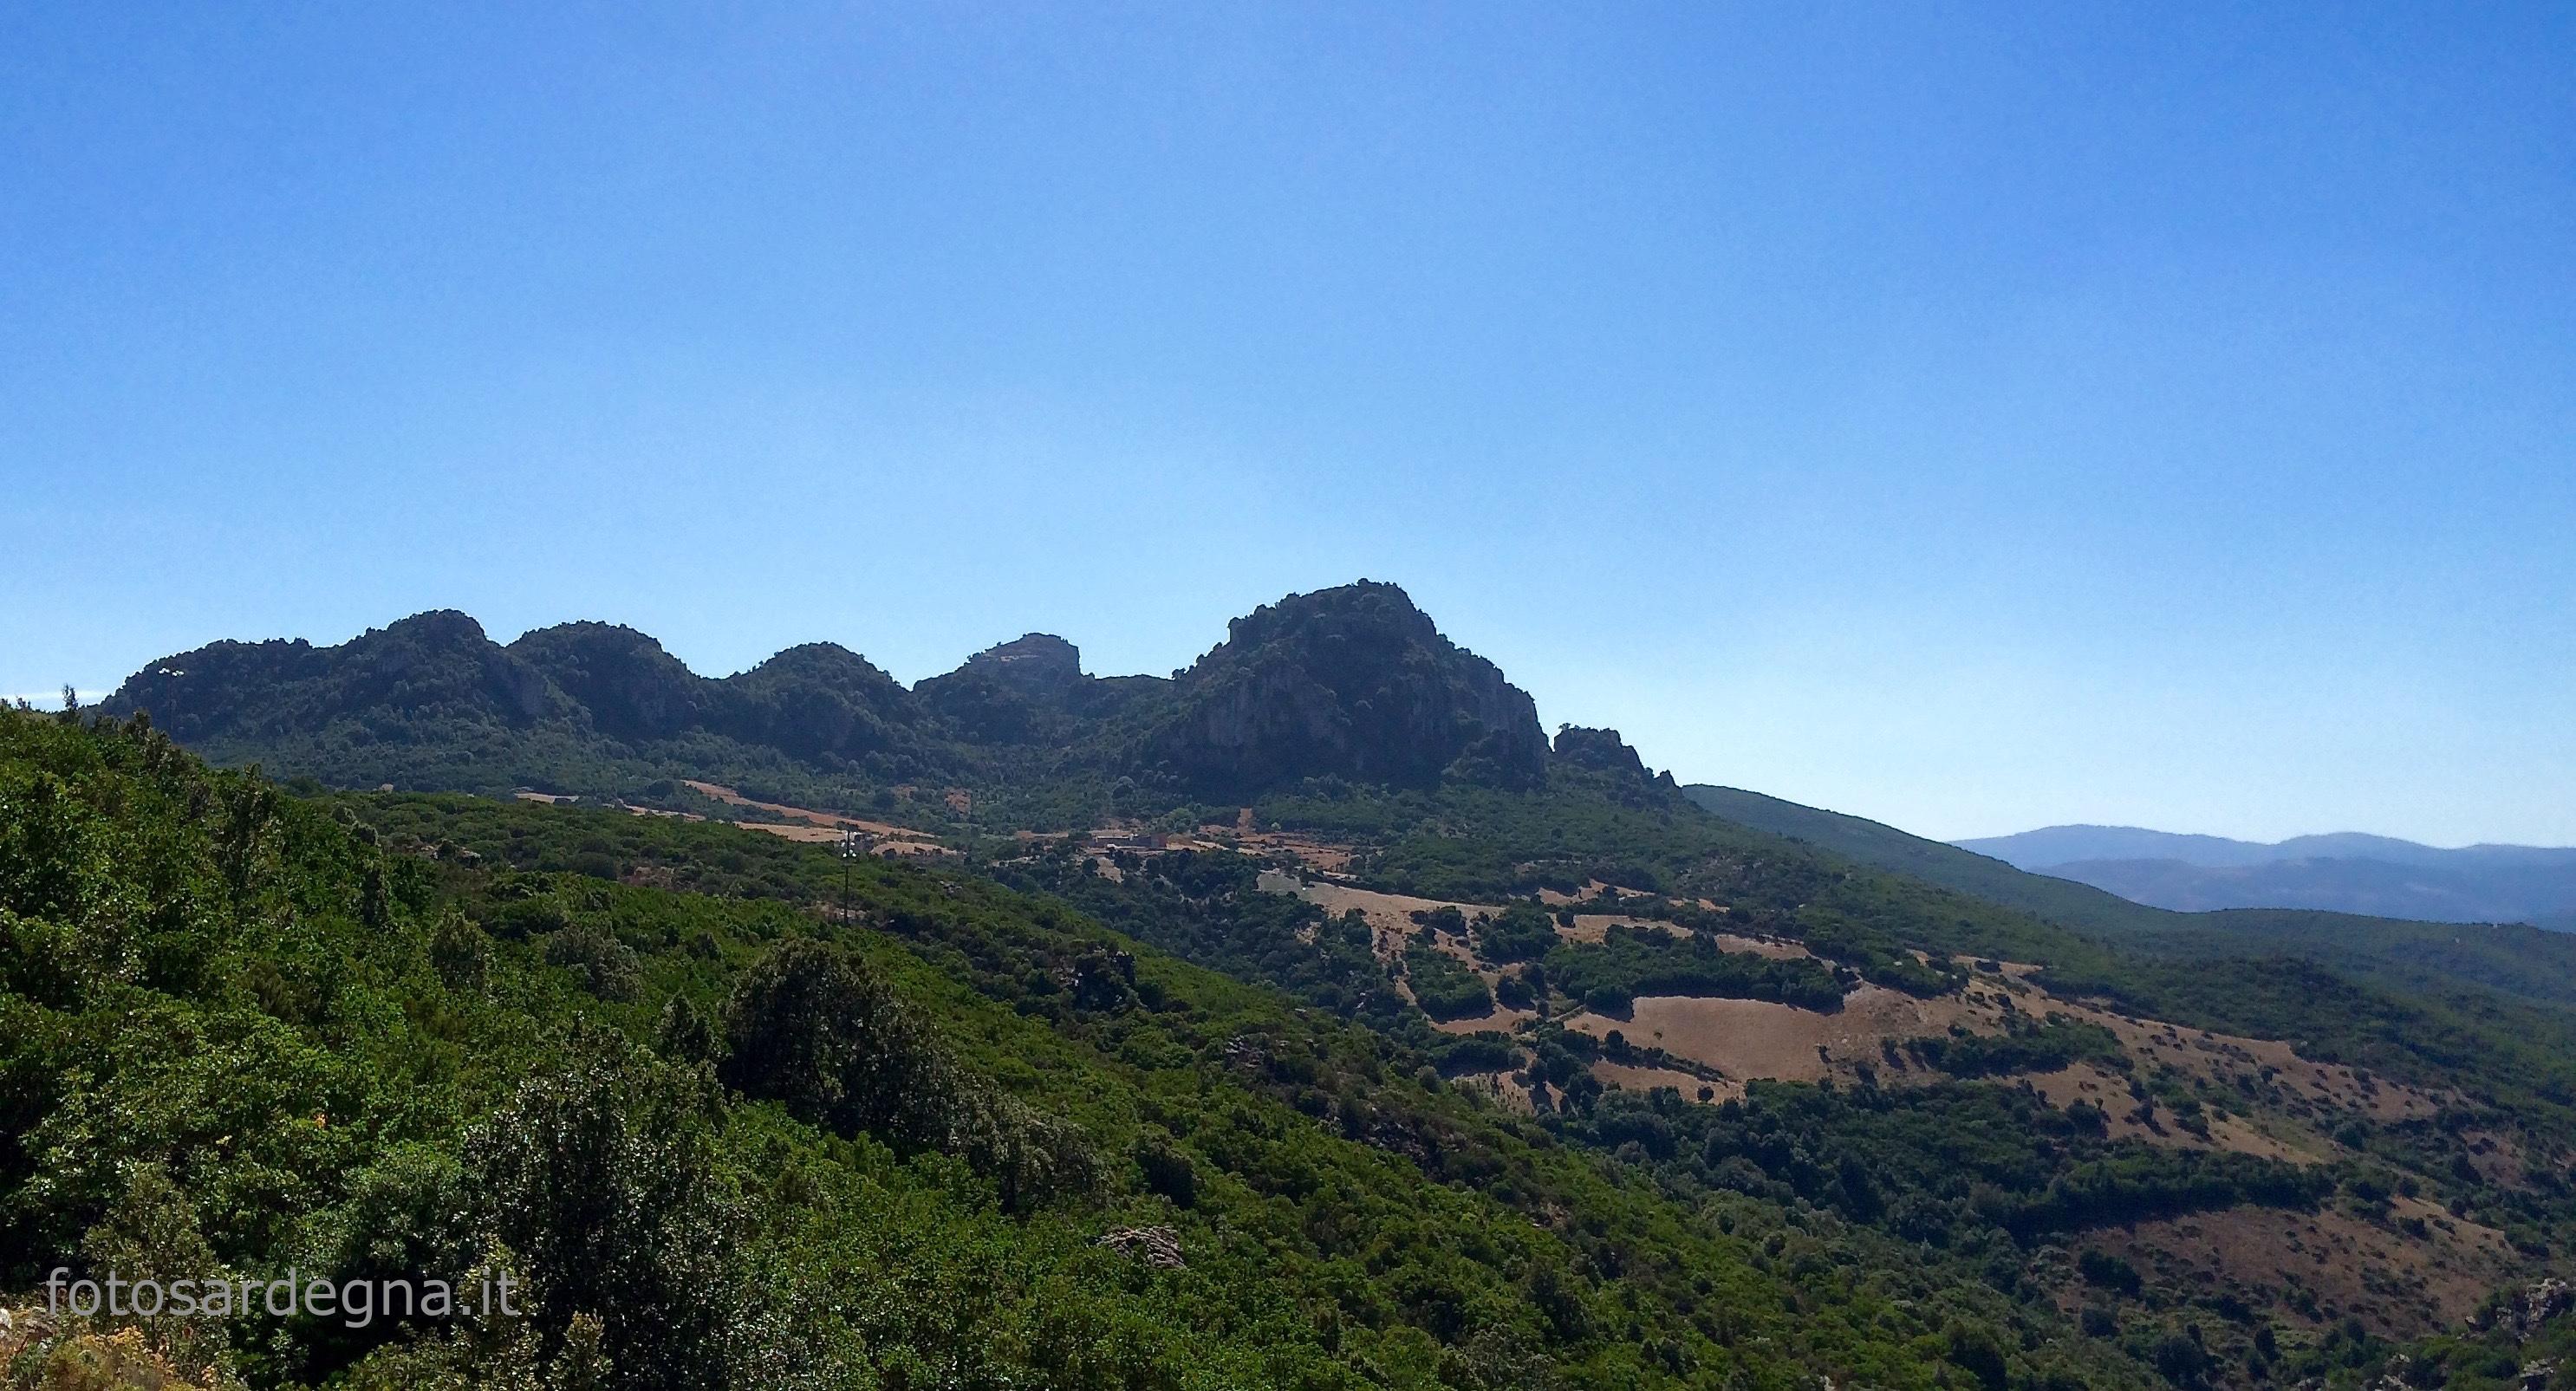 Il gruppo di Tacchi di Punta Corongiu (1.009 mt.), Monte Longu (964 mt.) e Pitzu de Gedili (910 mt.), in territorio di Ulassai.